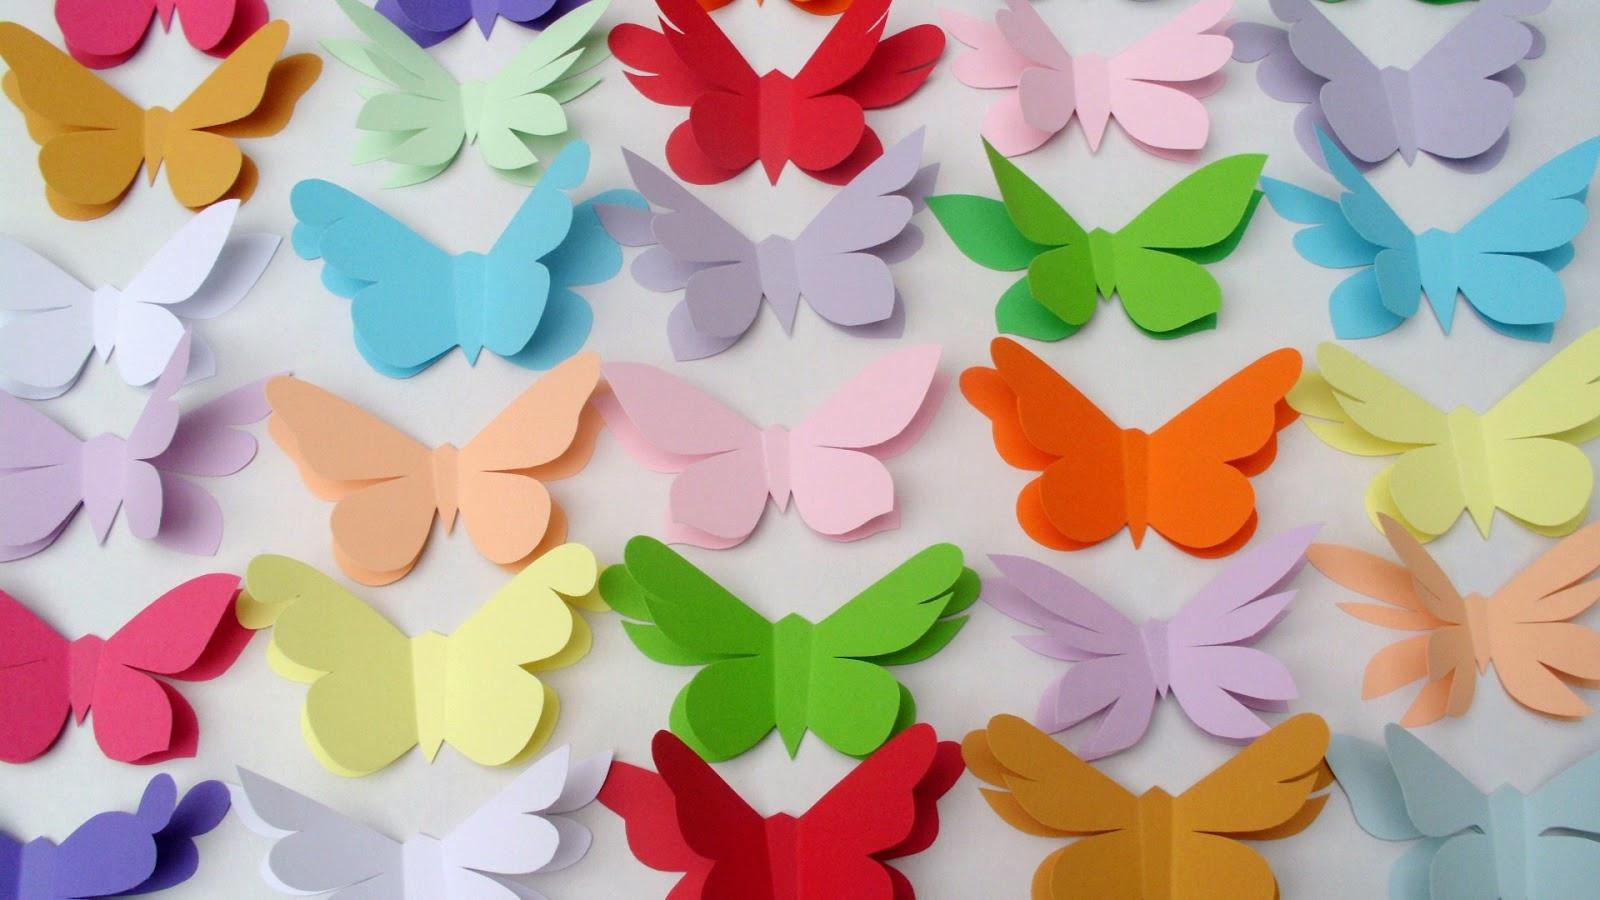 Planes de colorat de craciun online dating